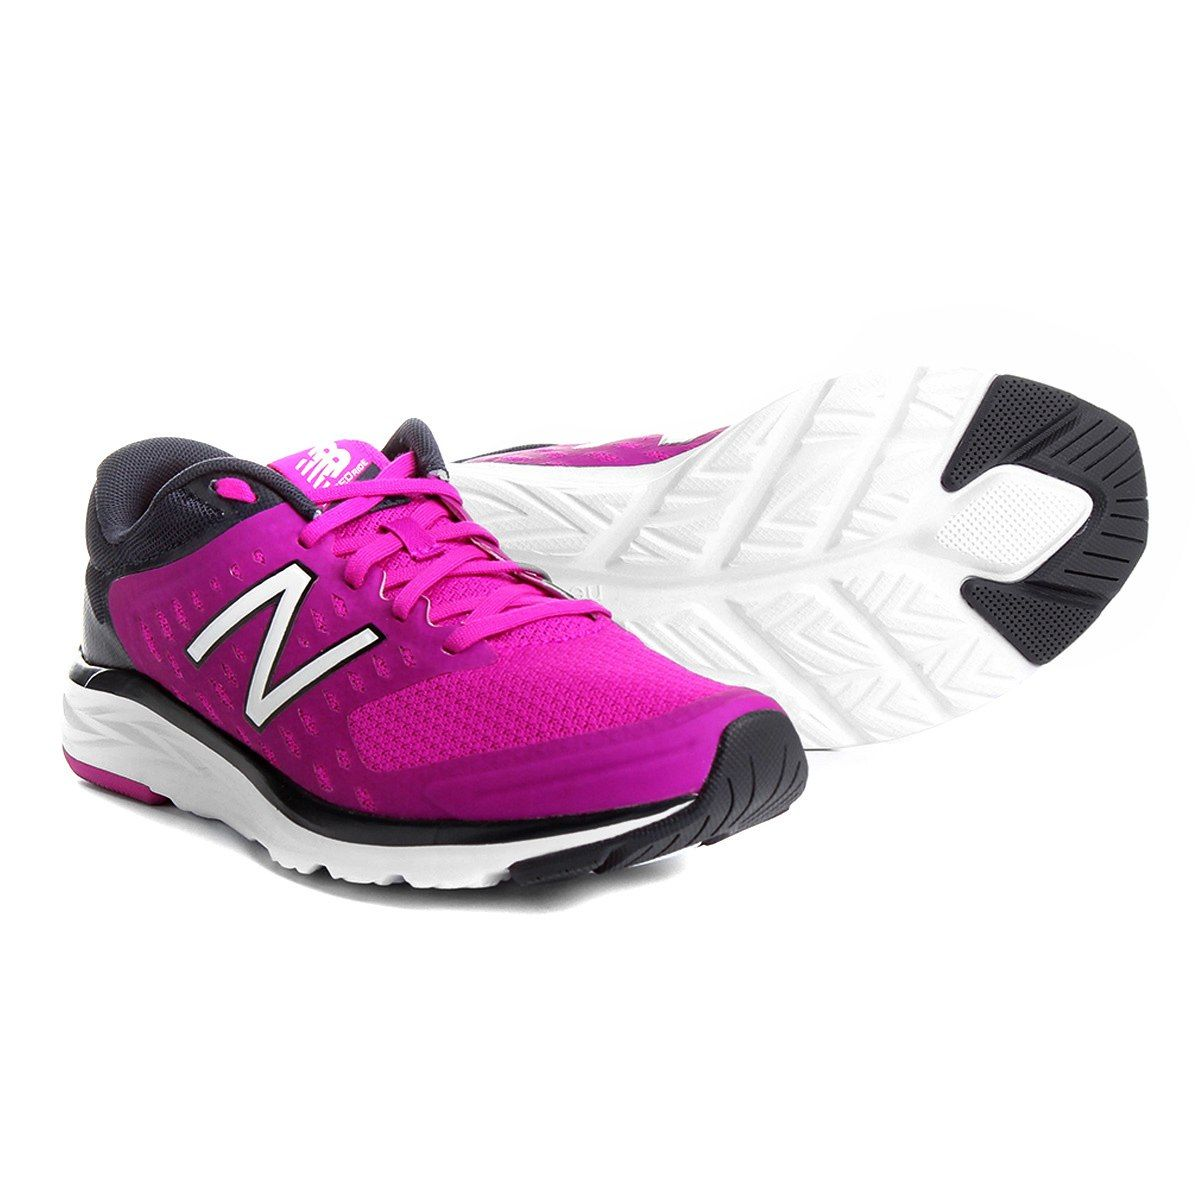 467ef432216 Tenis Casual New Balance Newengland - Cinza